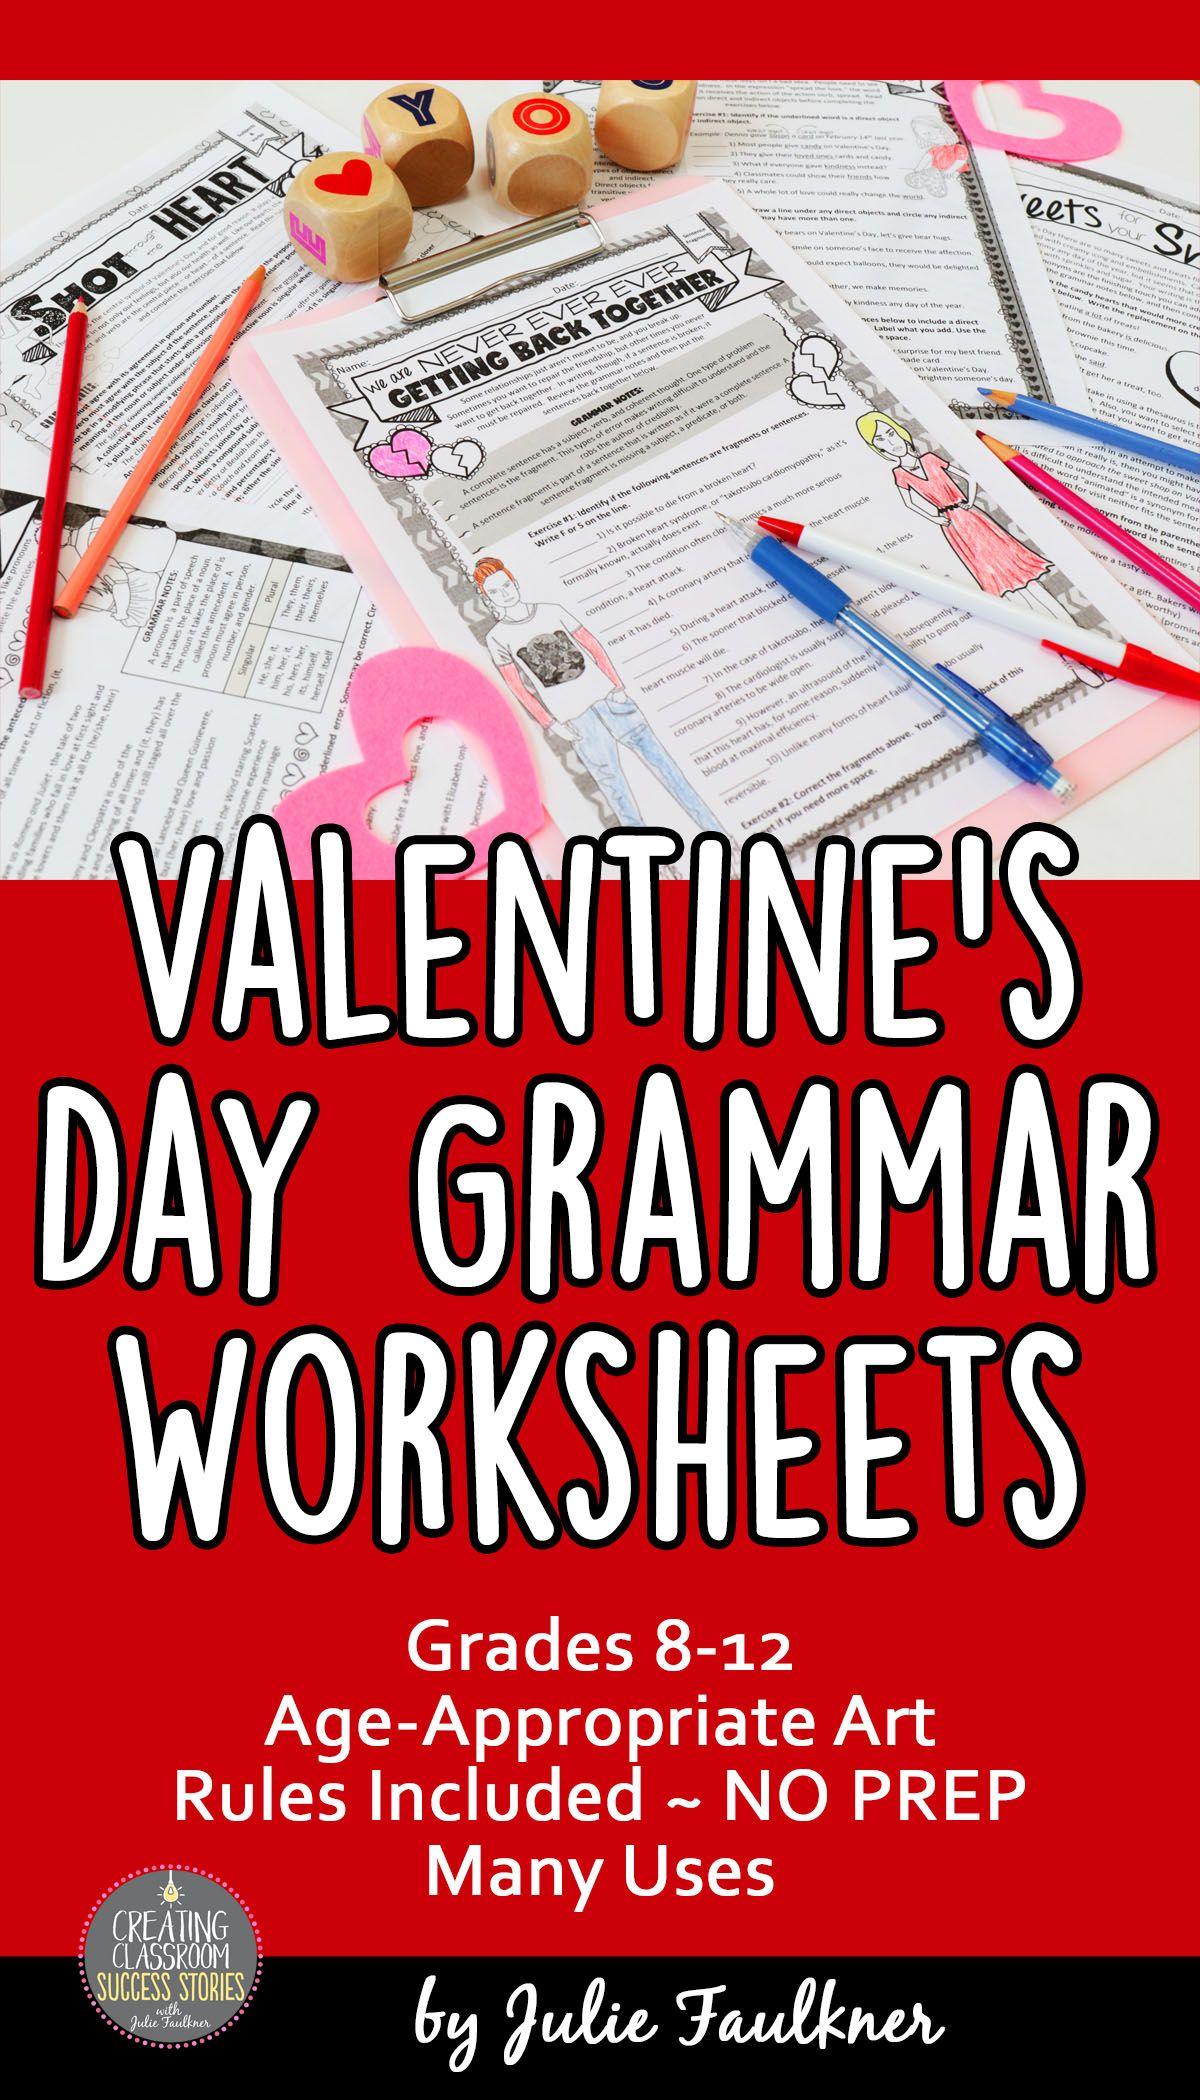 Valentine S Day Grammar Worksheets Activities For Teens Grammar Worksheets Teaching Teens [ 2100 x 1200 Pixel ]